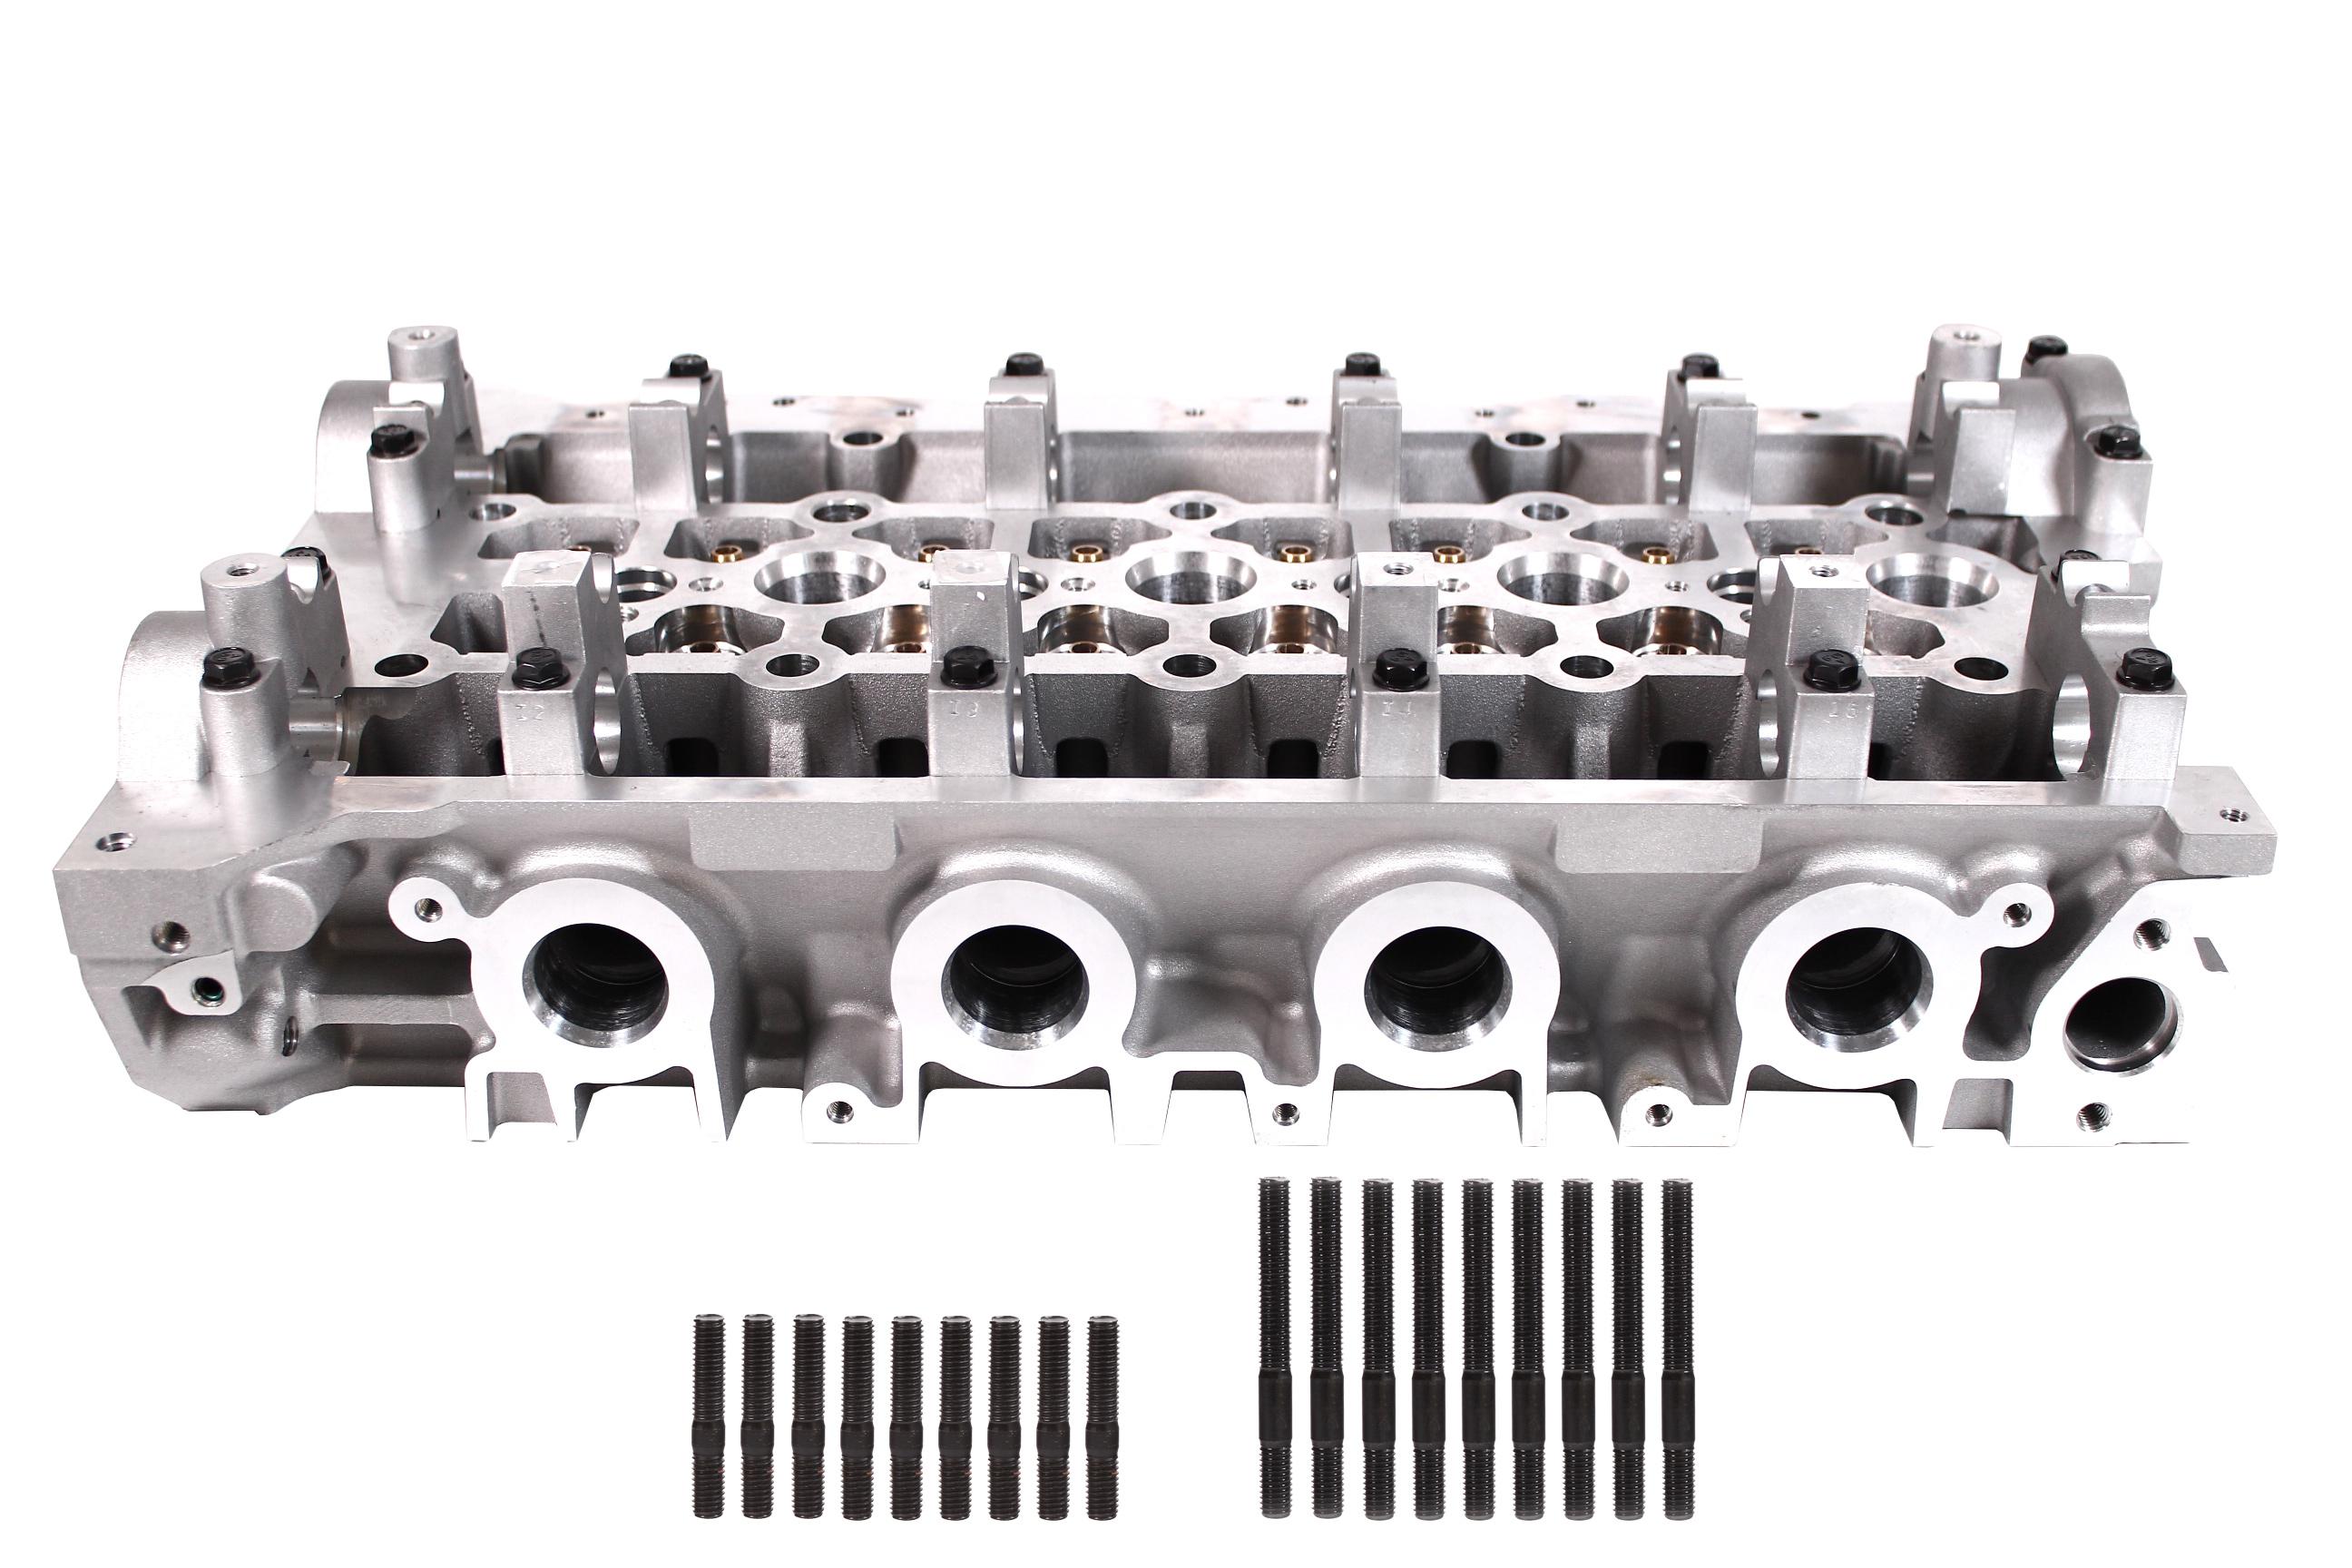 Testa cilindro Nissan Primastar X83 2,5 2,5 dCi G9U G9U730 1104100QA0 NUOVO